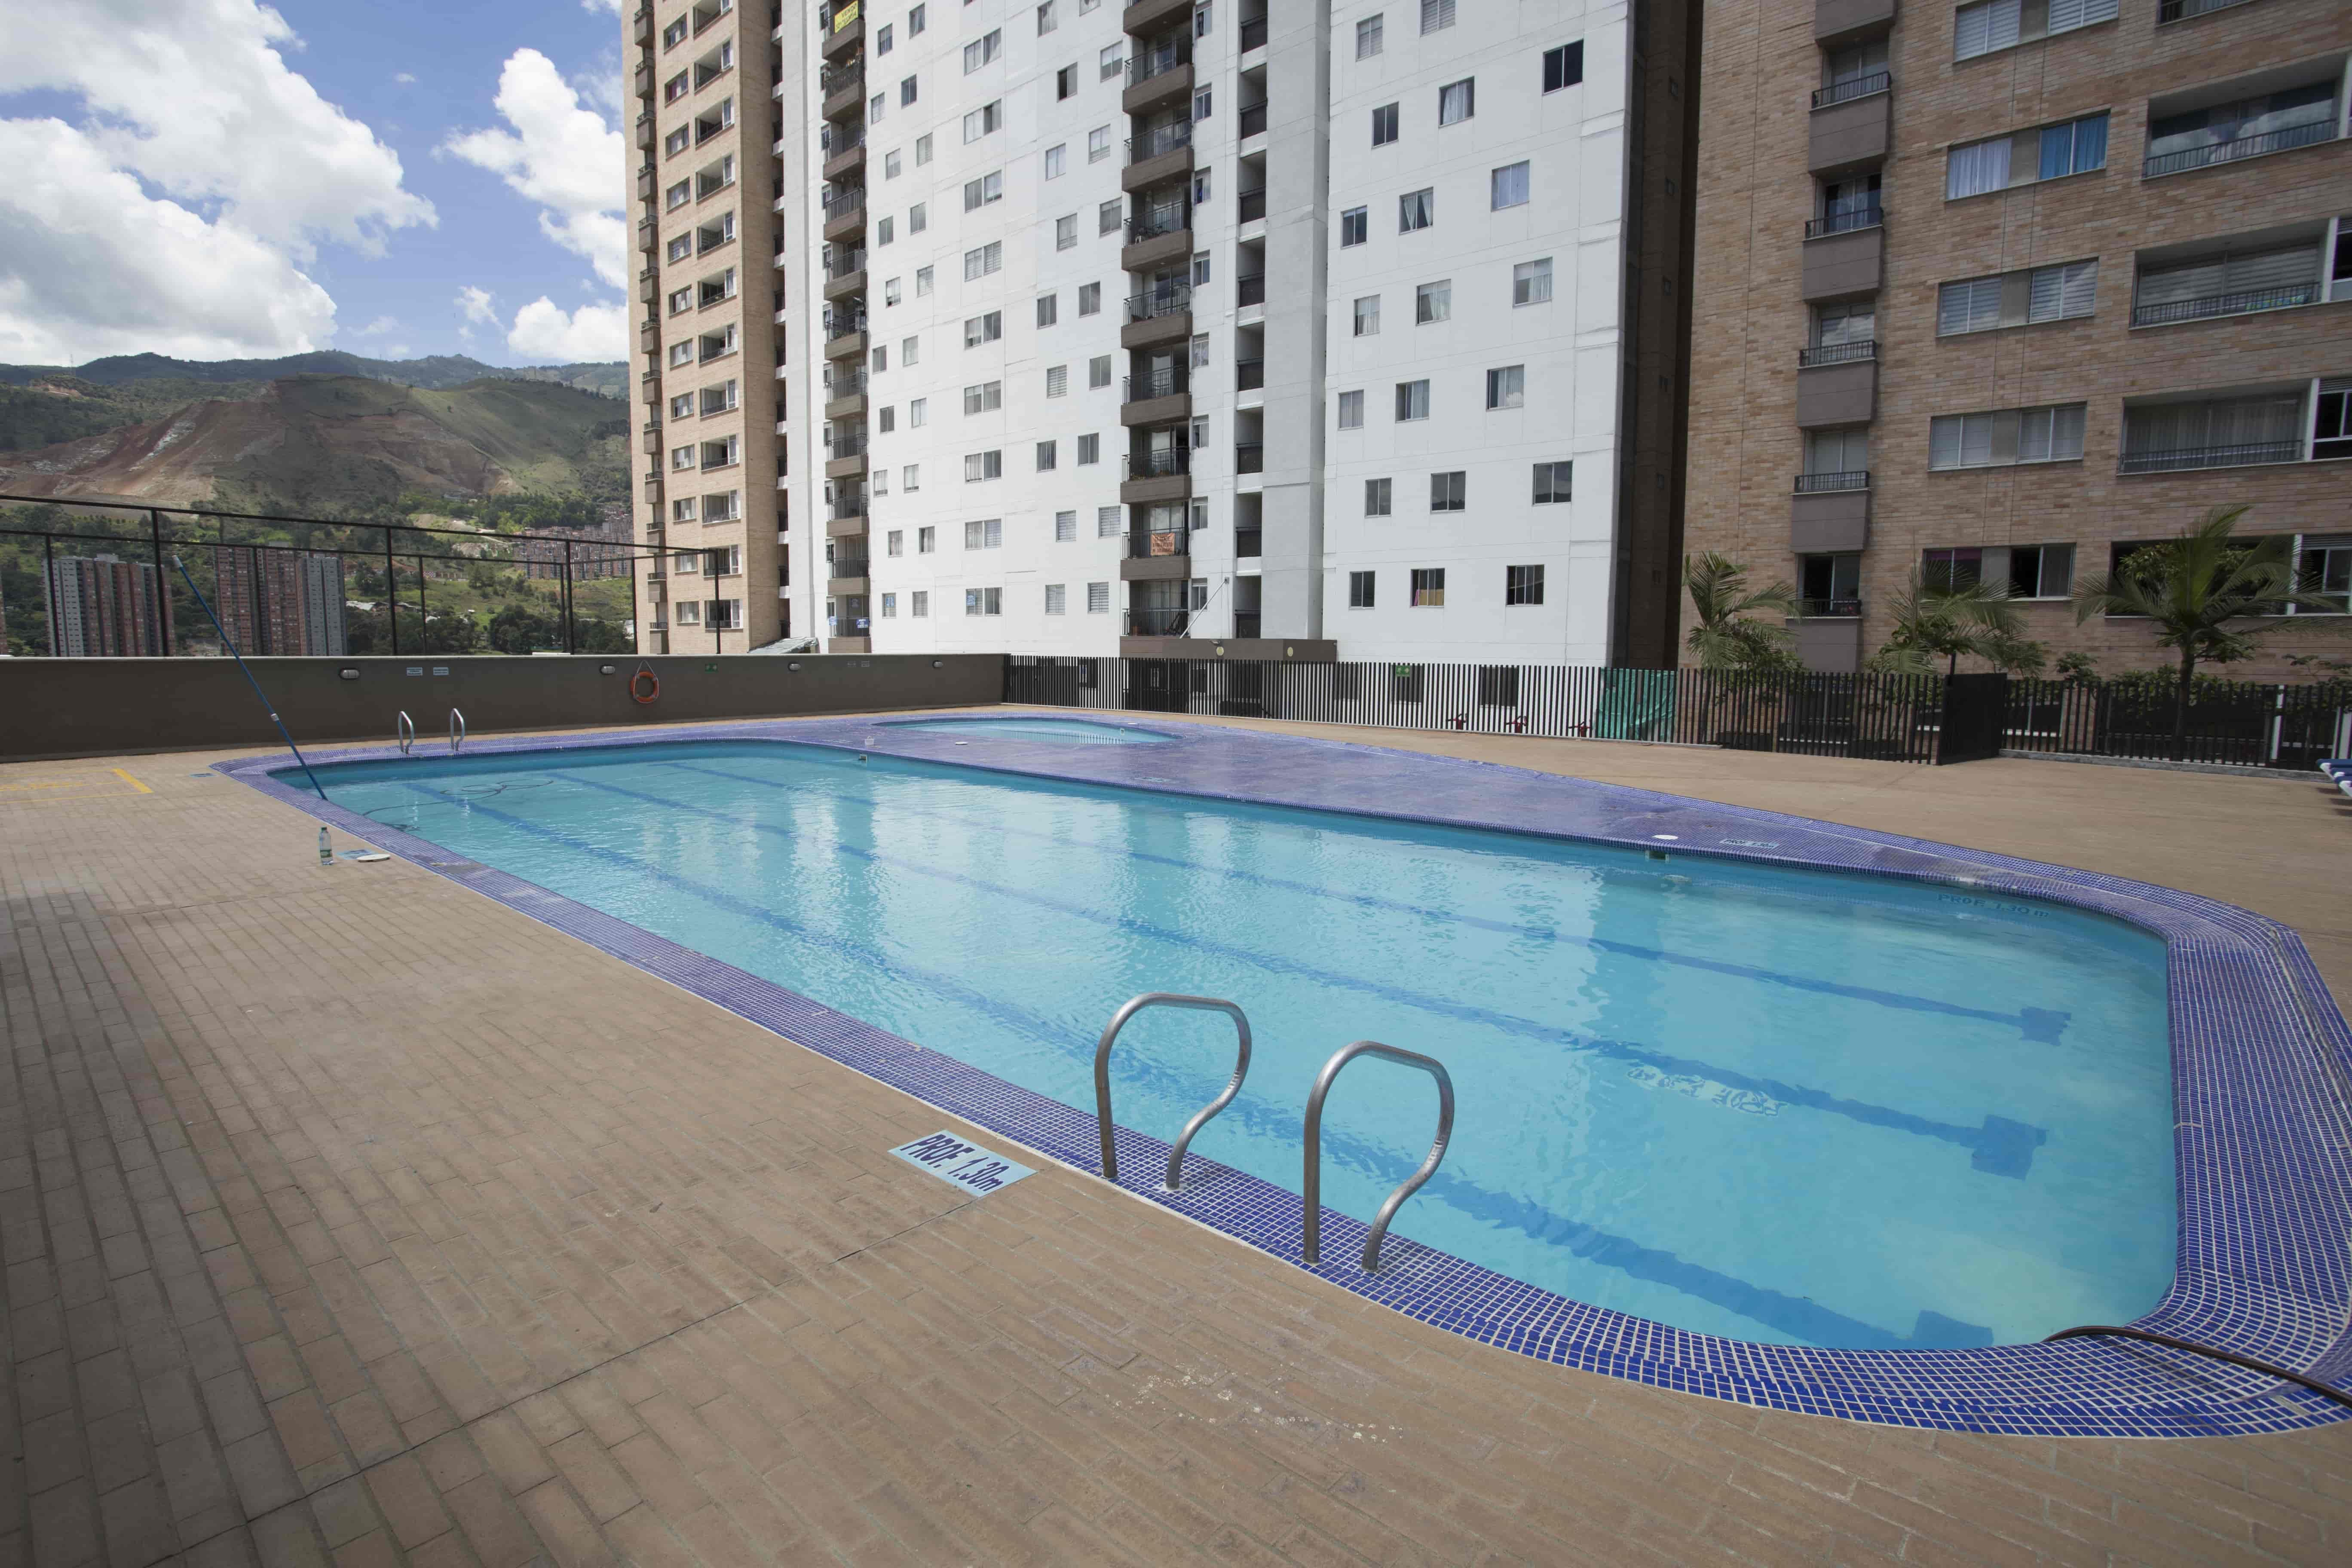 Apartamentos usados Oporto Ciudadela Bello